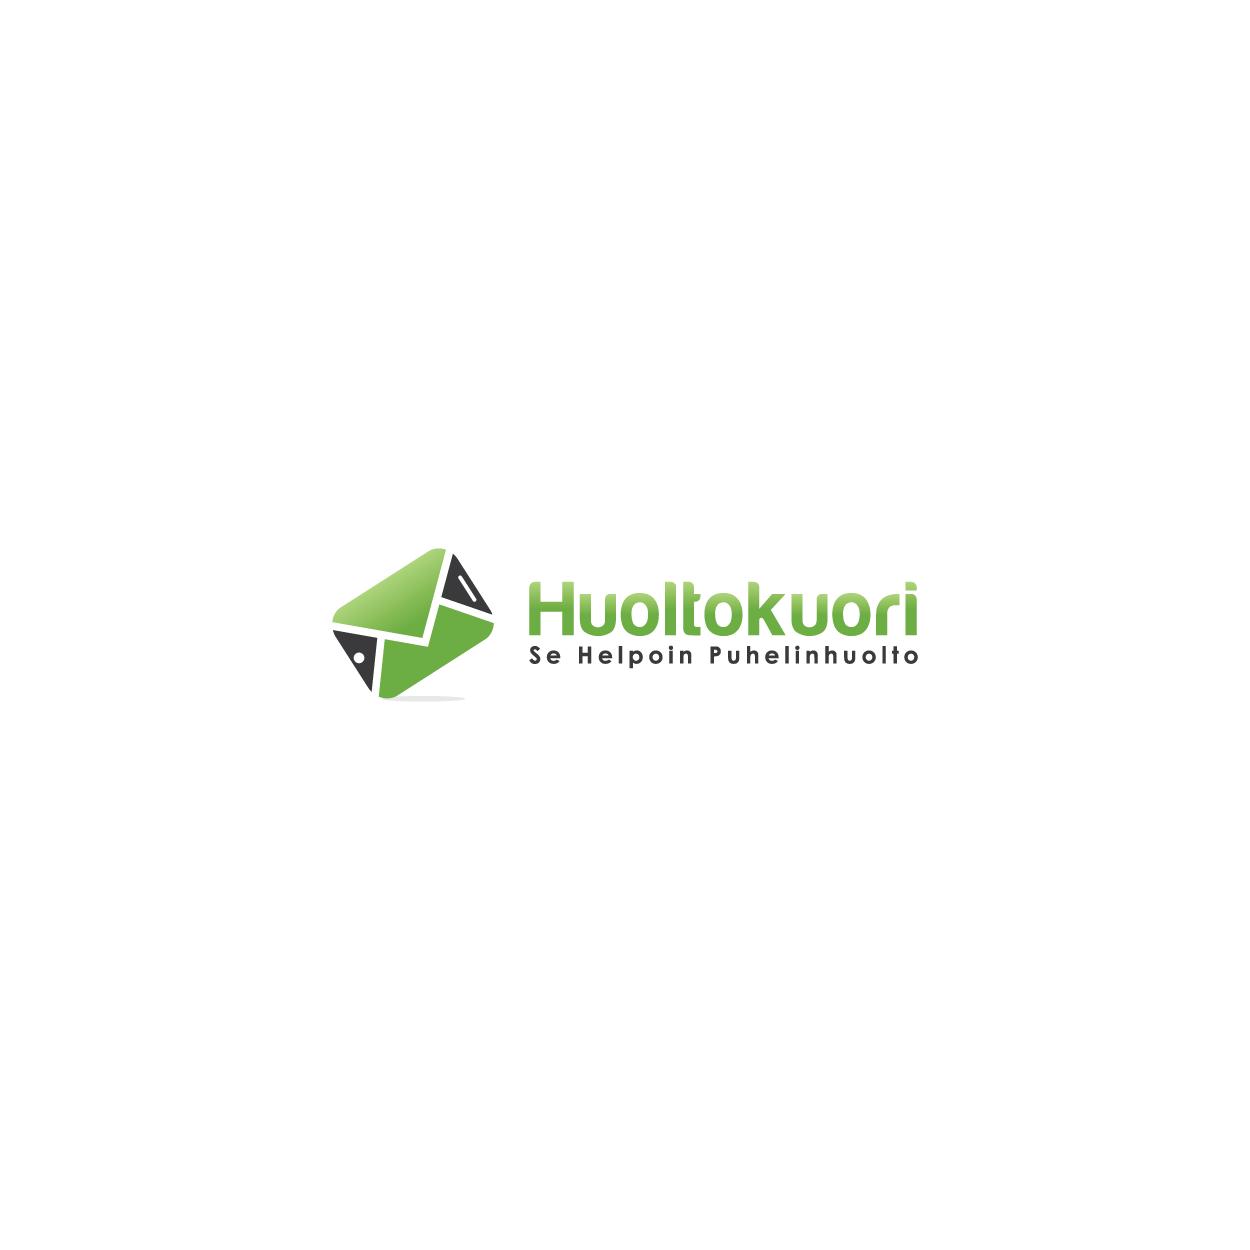 Help Huoltokuori with a new logo